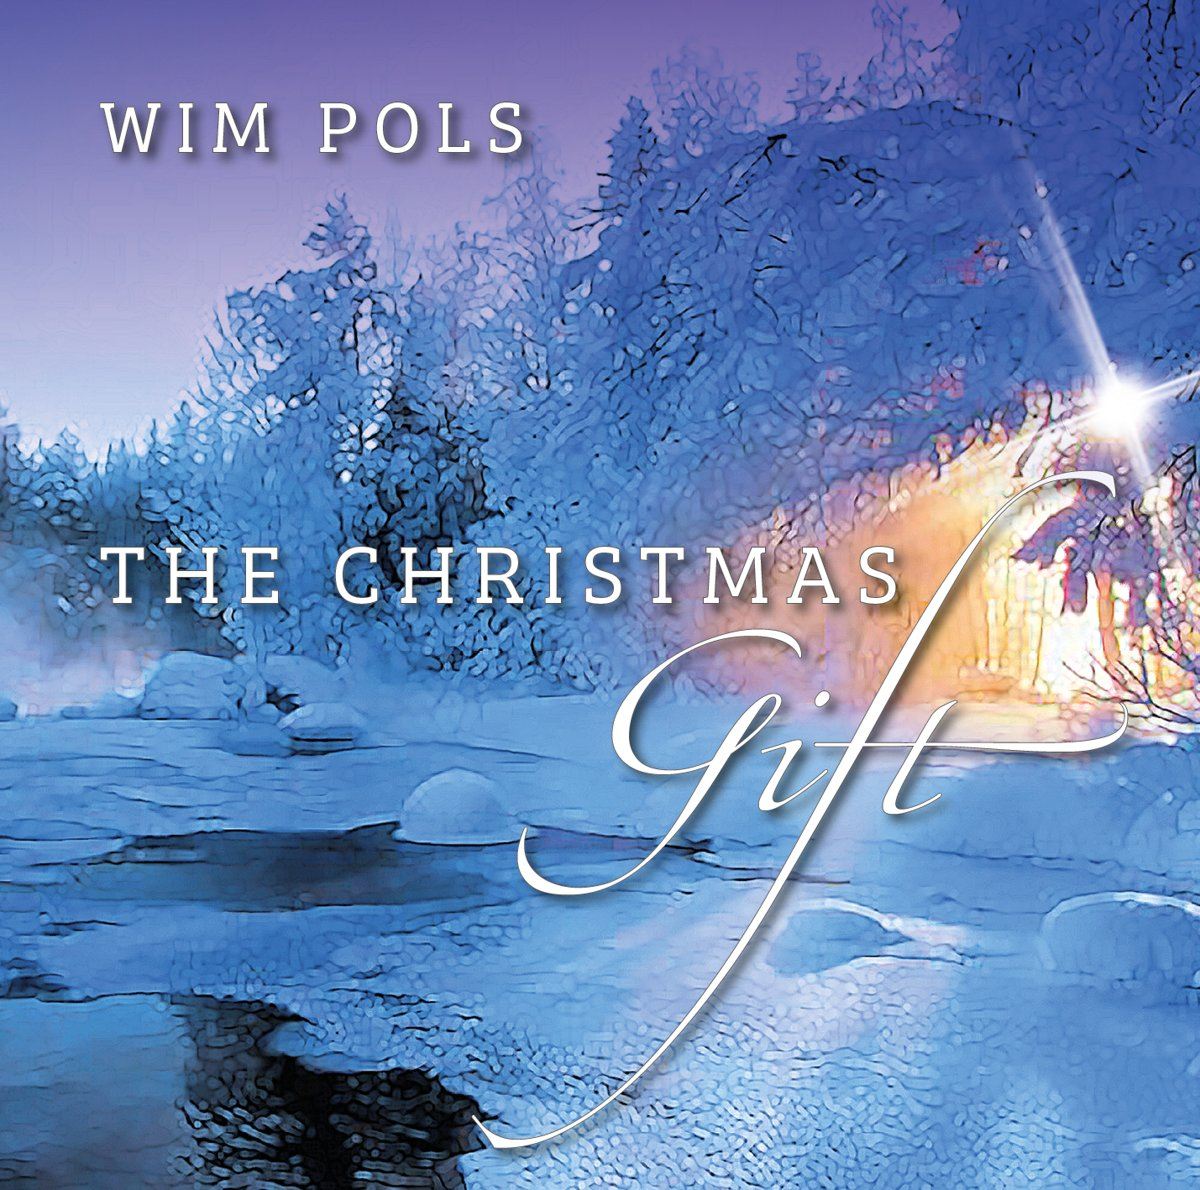 Wim Pols - The Christmas Gift kopen